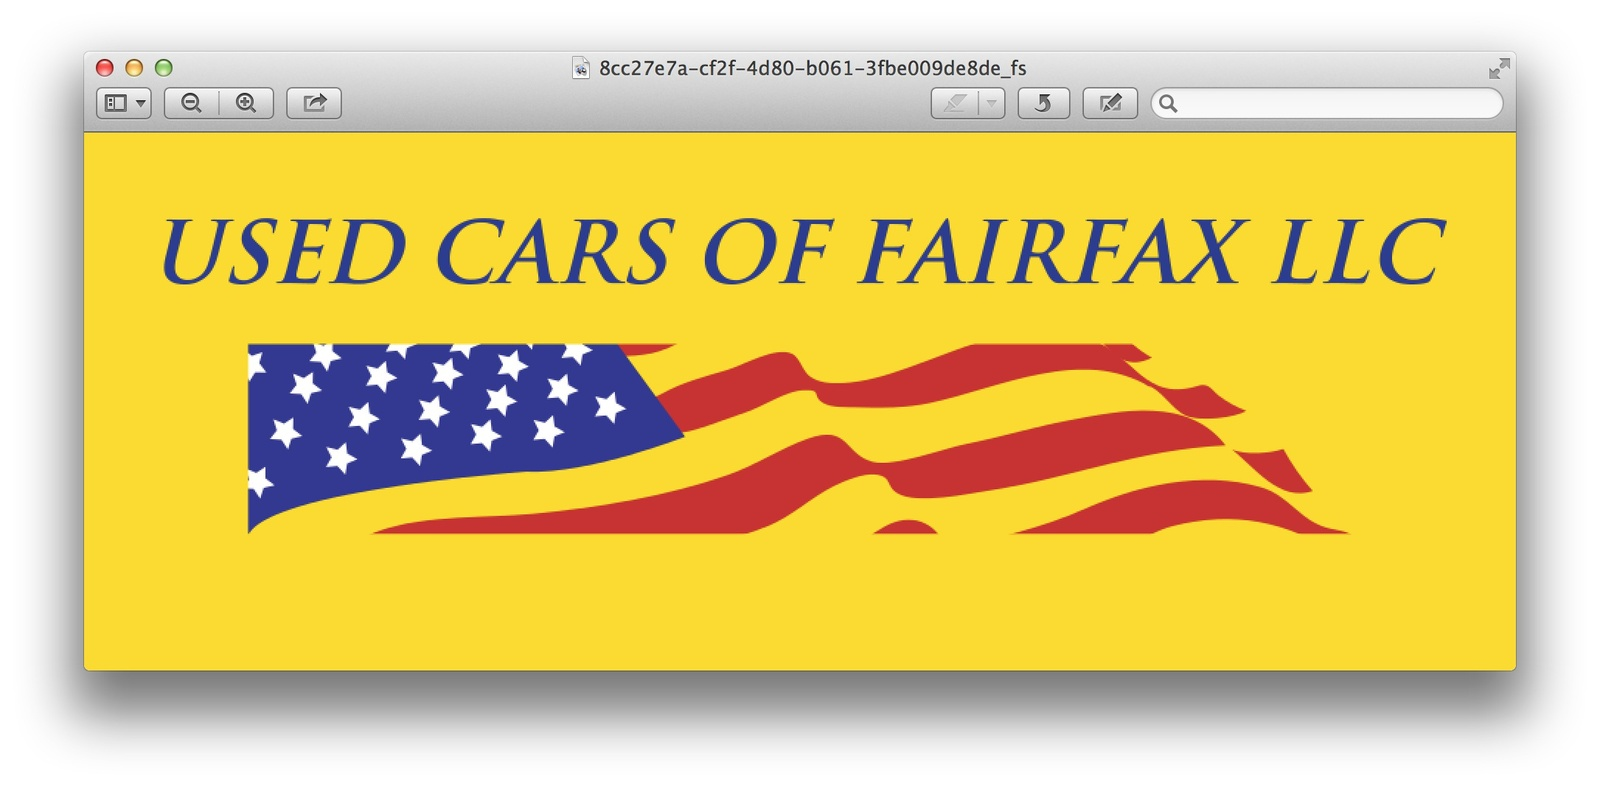 Fairfax Honda Used Cars Inventory